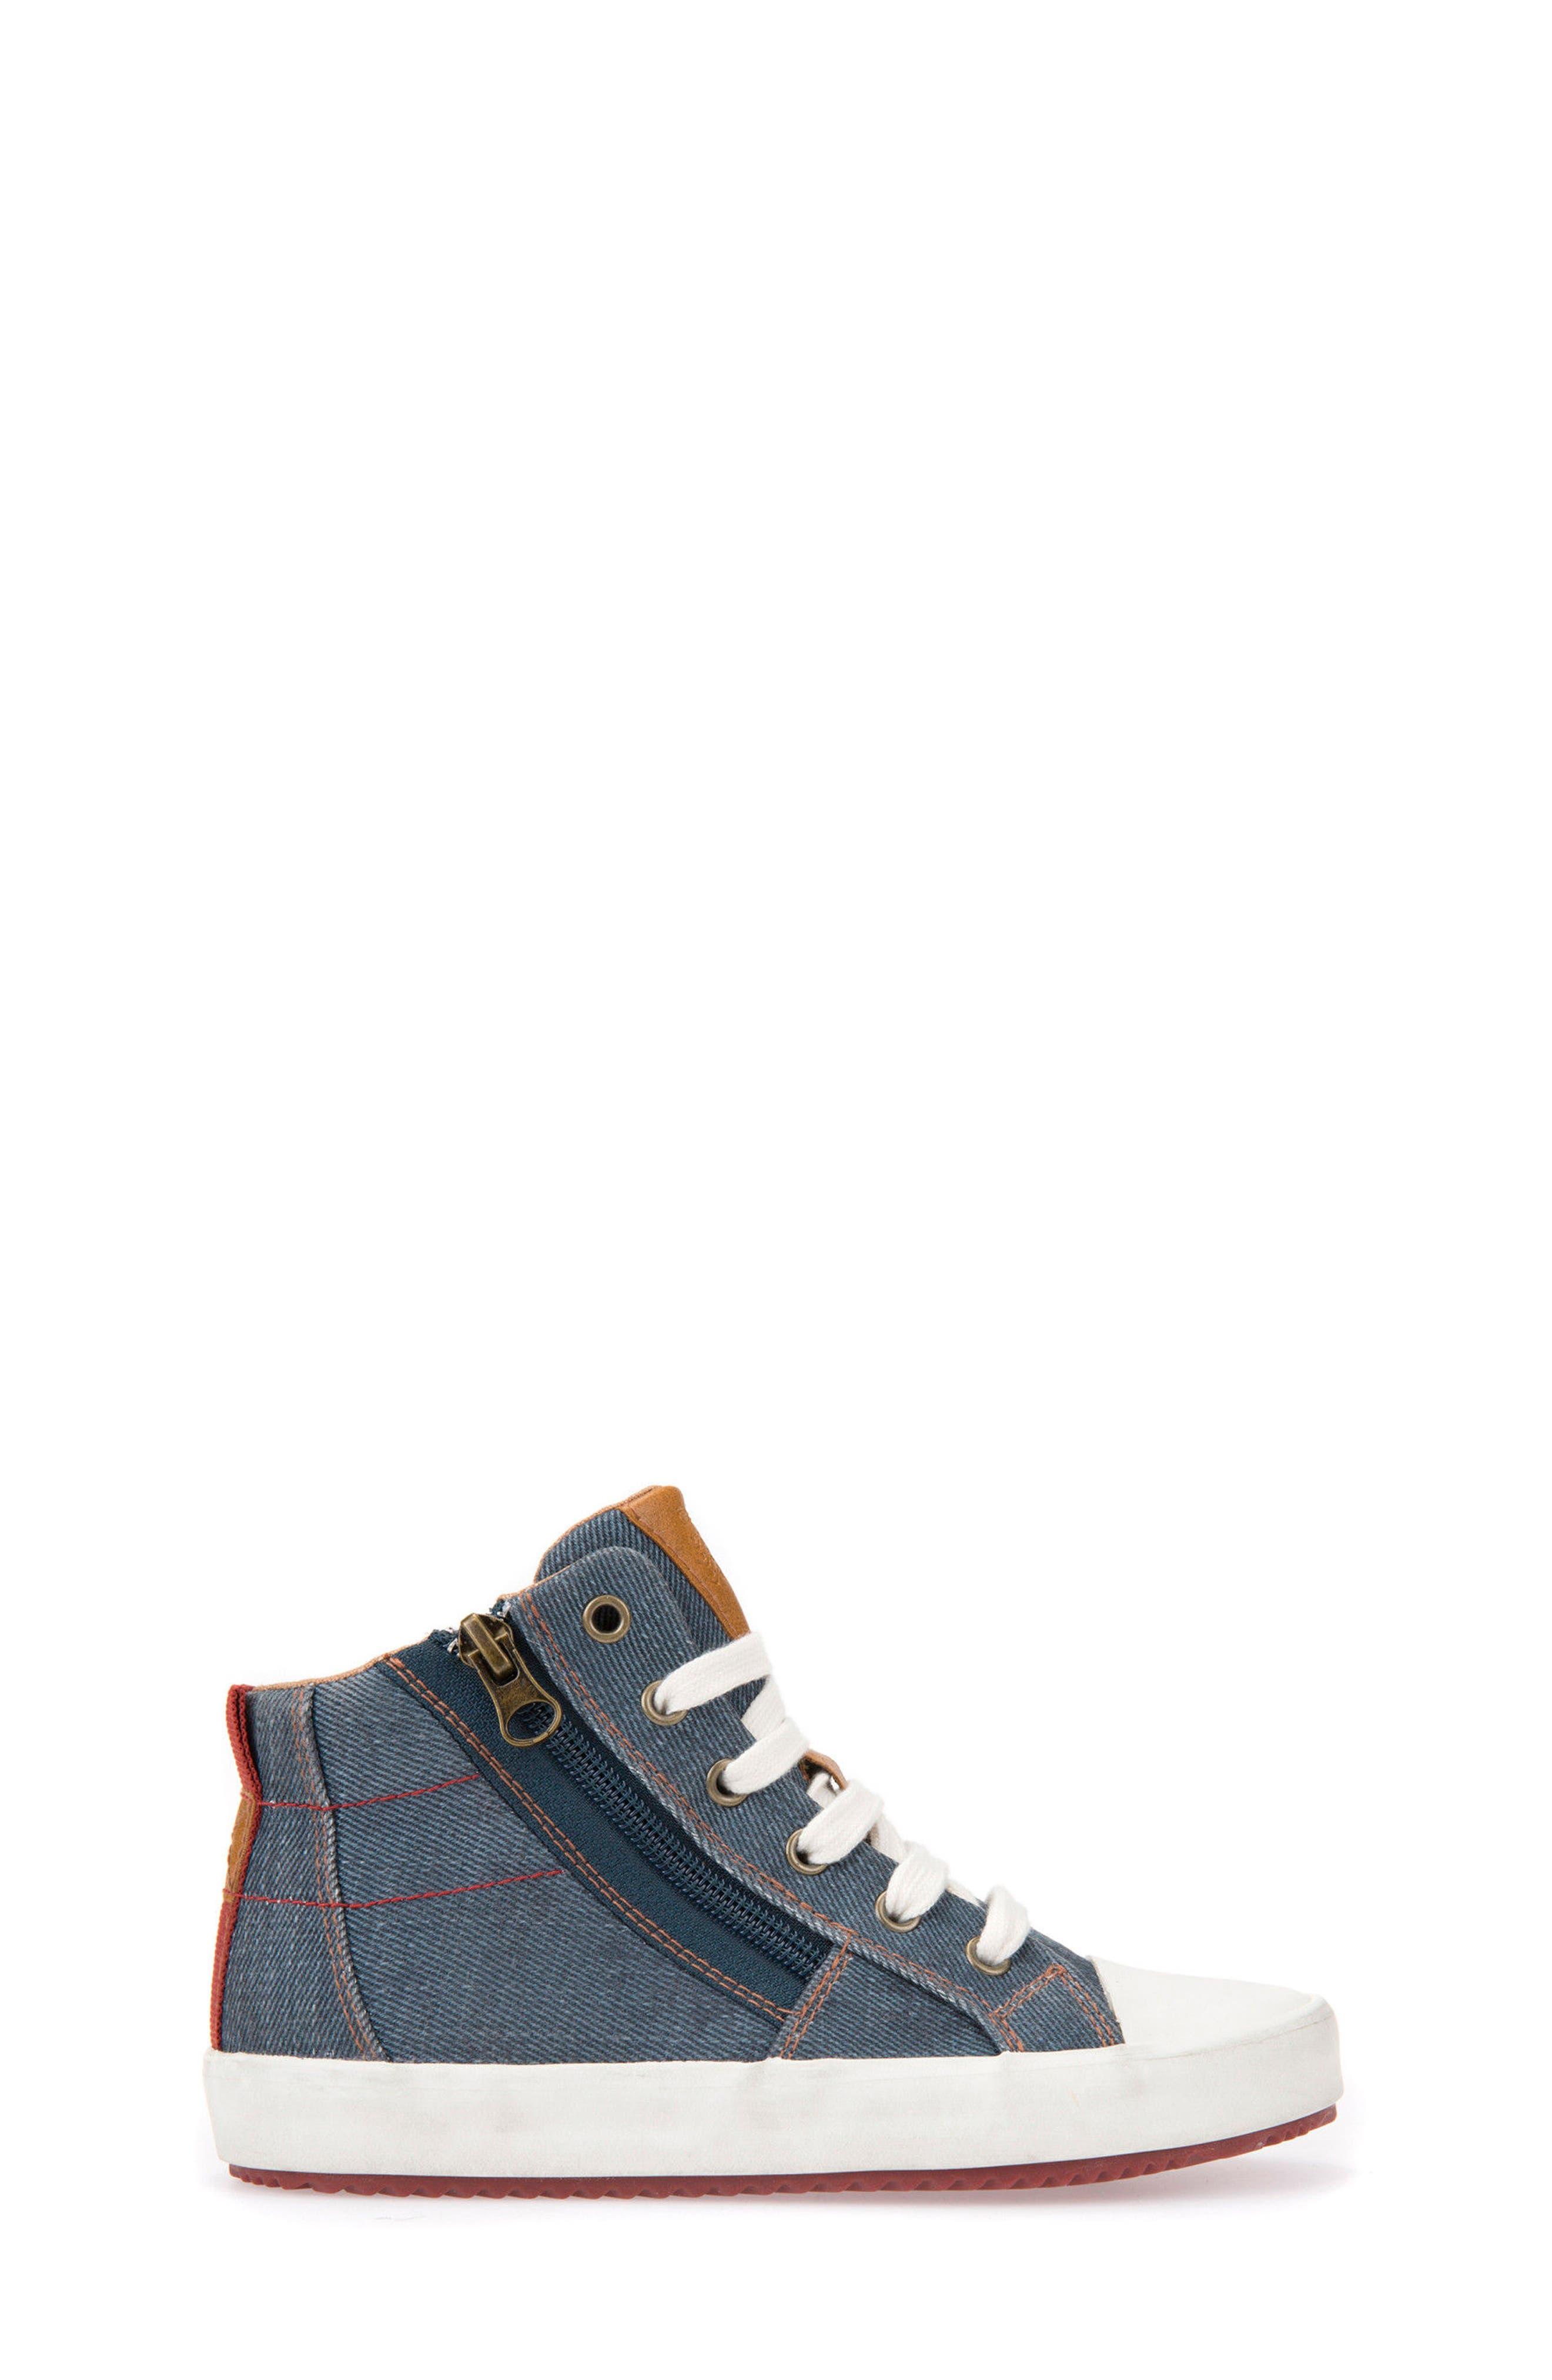 Alonisso High Top Sneaker,                             Alternate thumbnail 3, color,                             Blue/ Dark Red